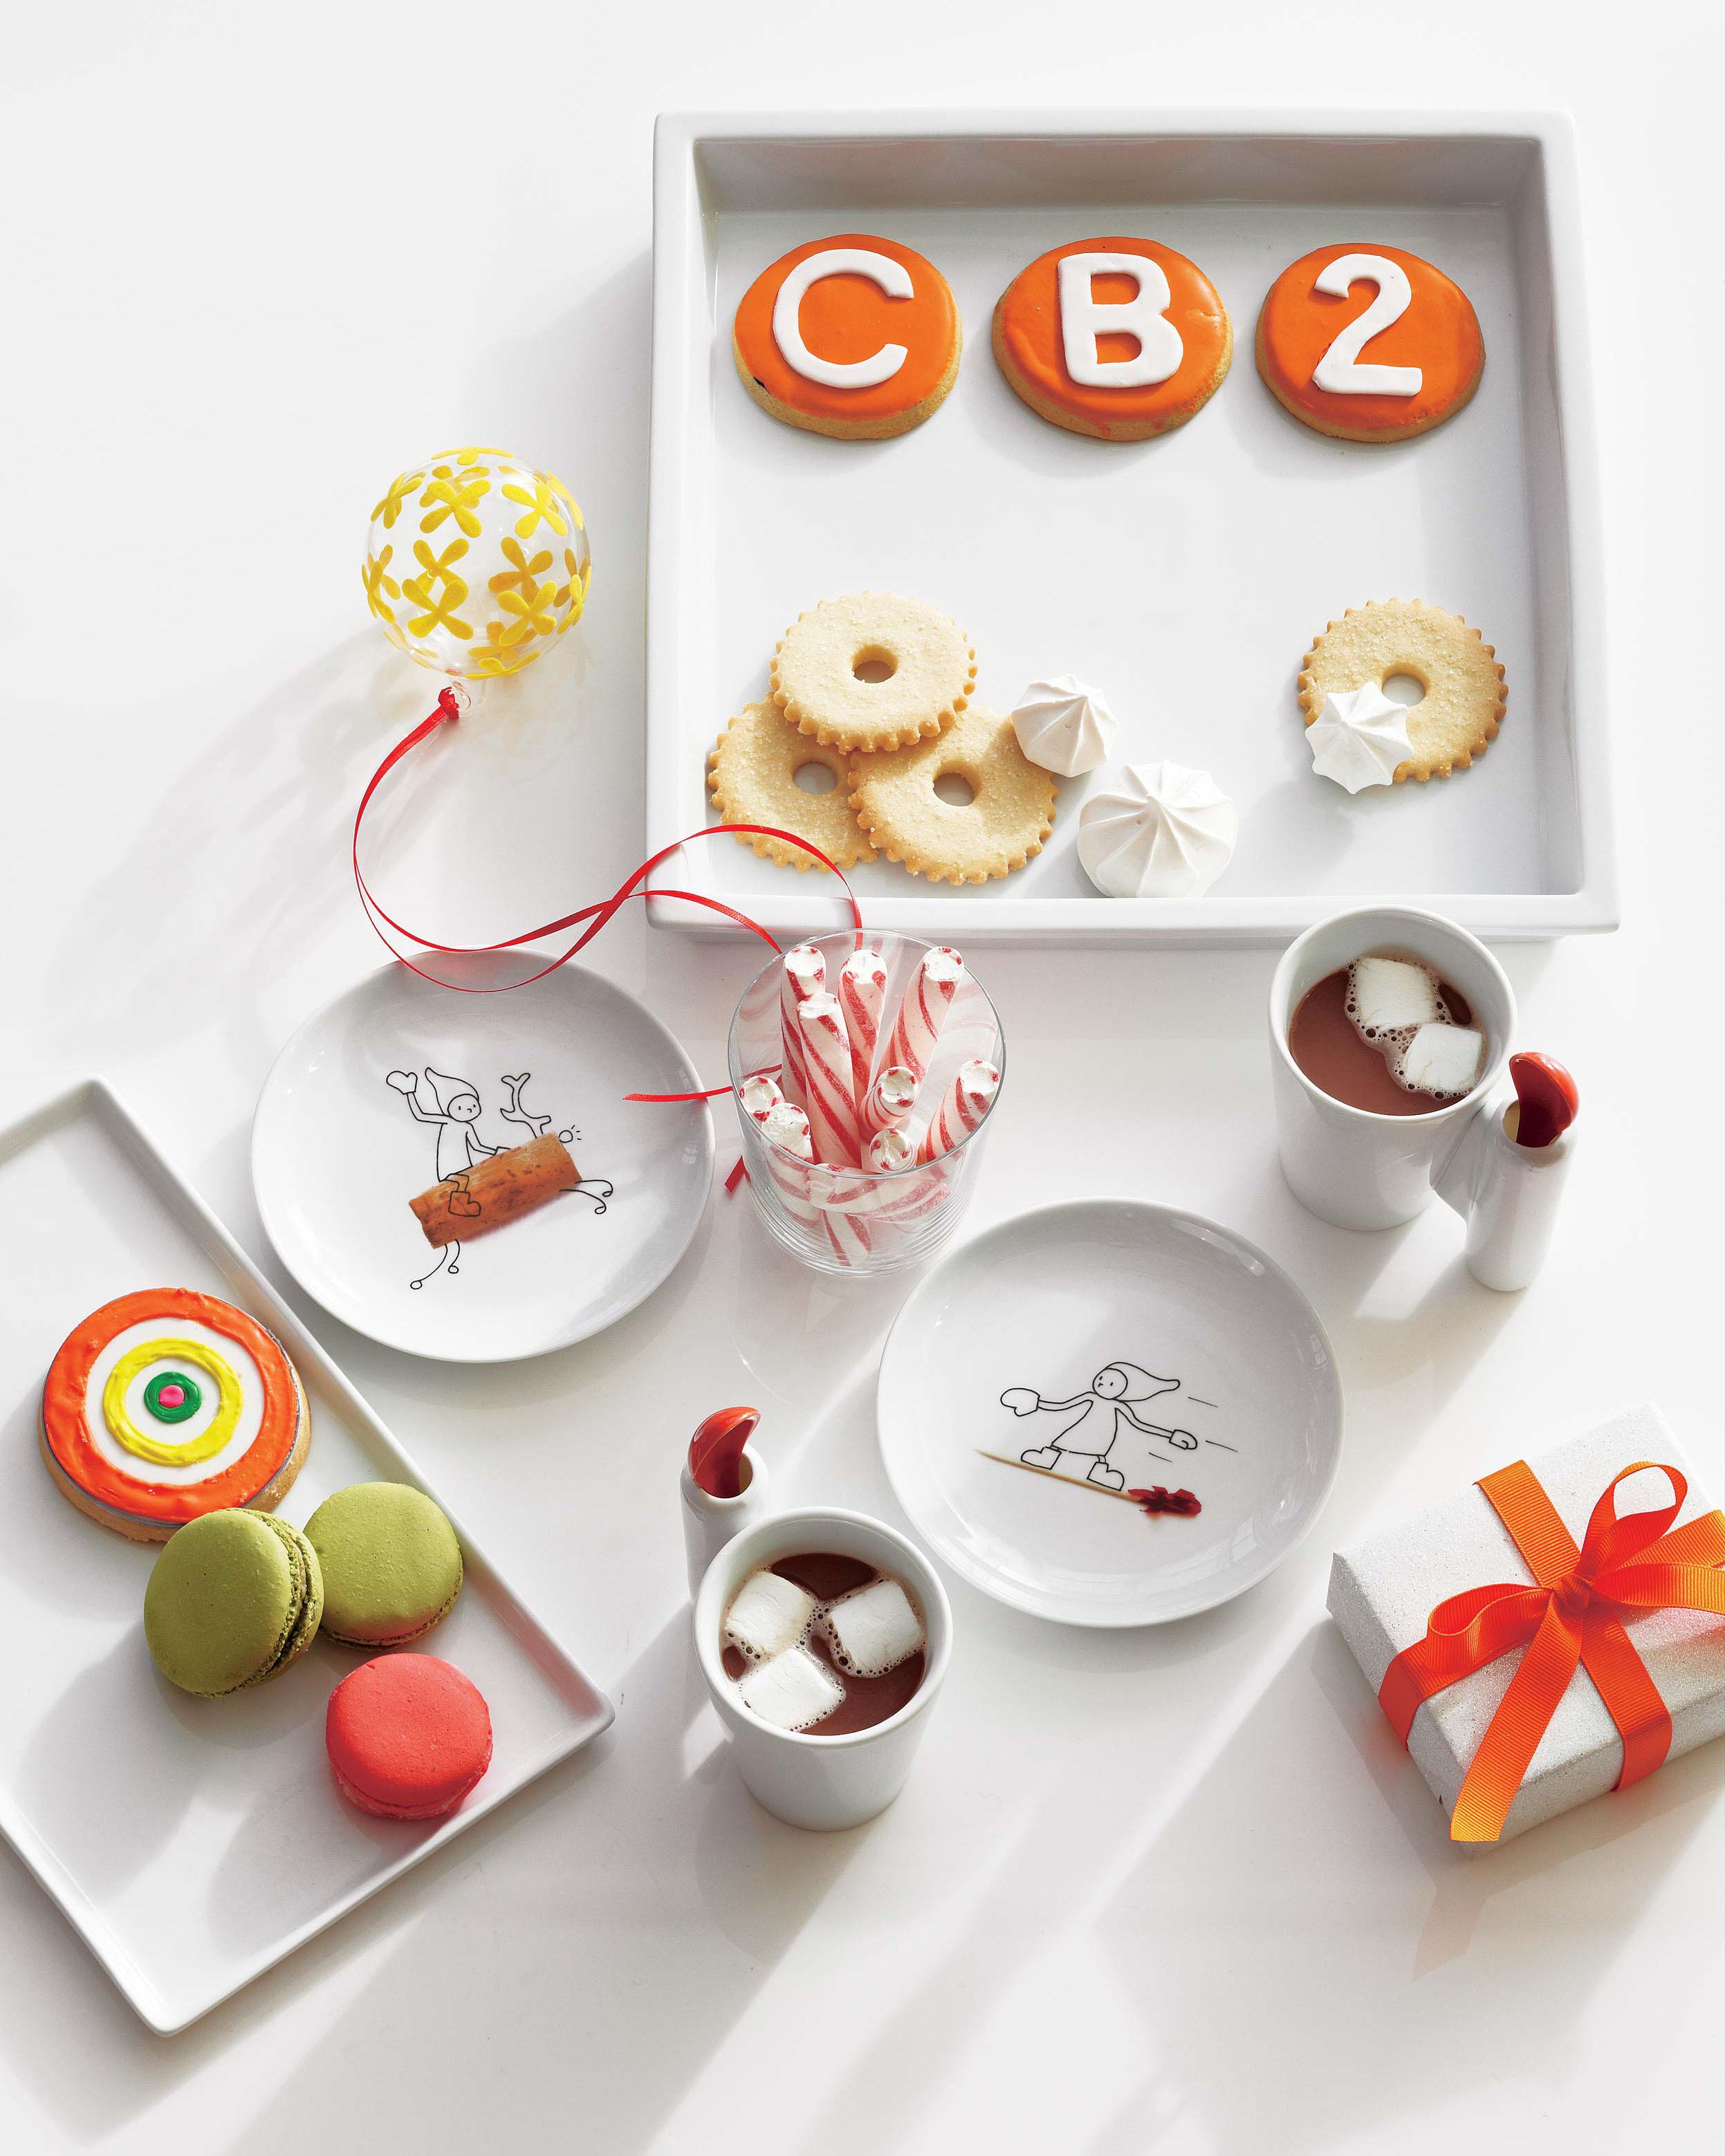 CB2_cookies_plates_molly-fitzsimons.jpg